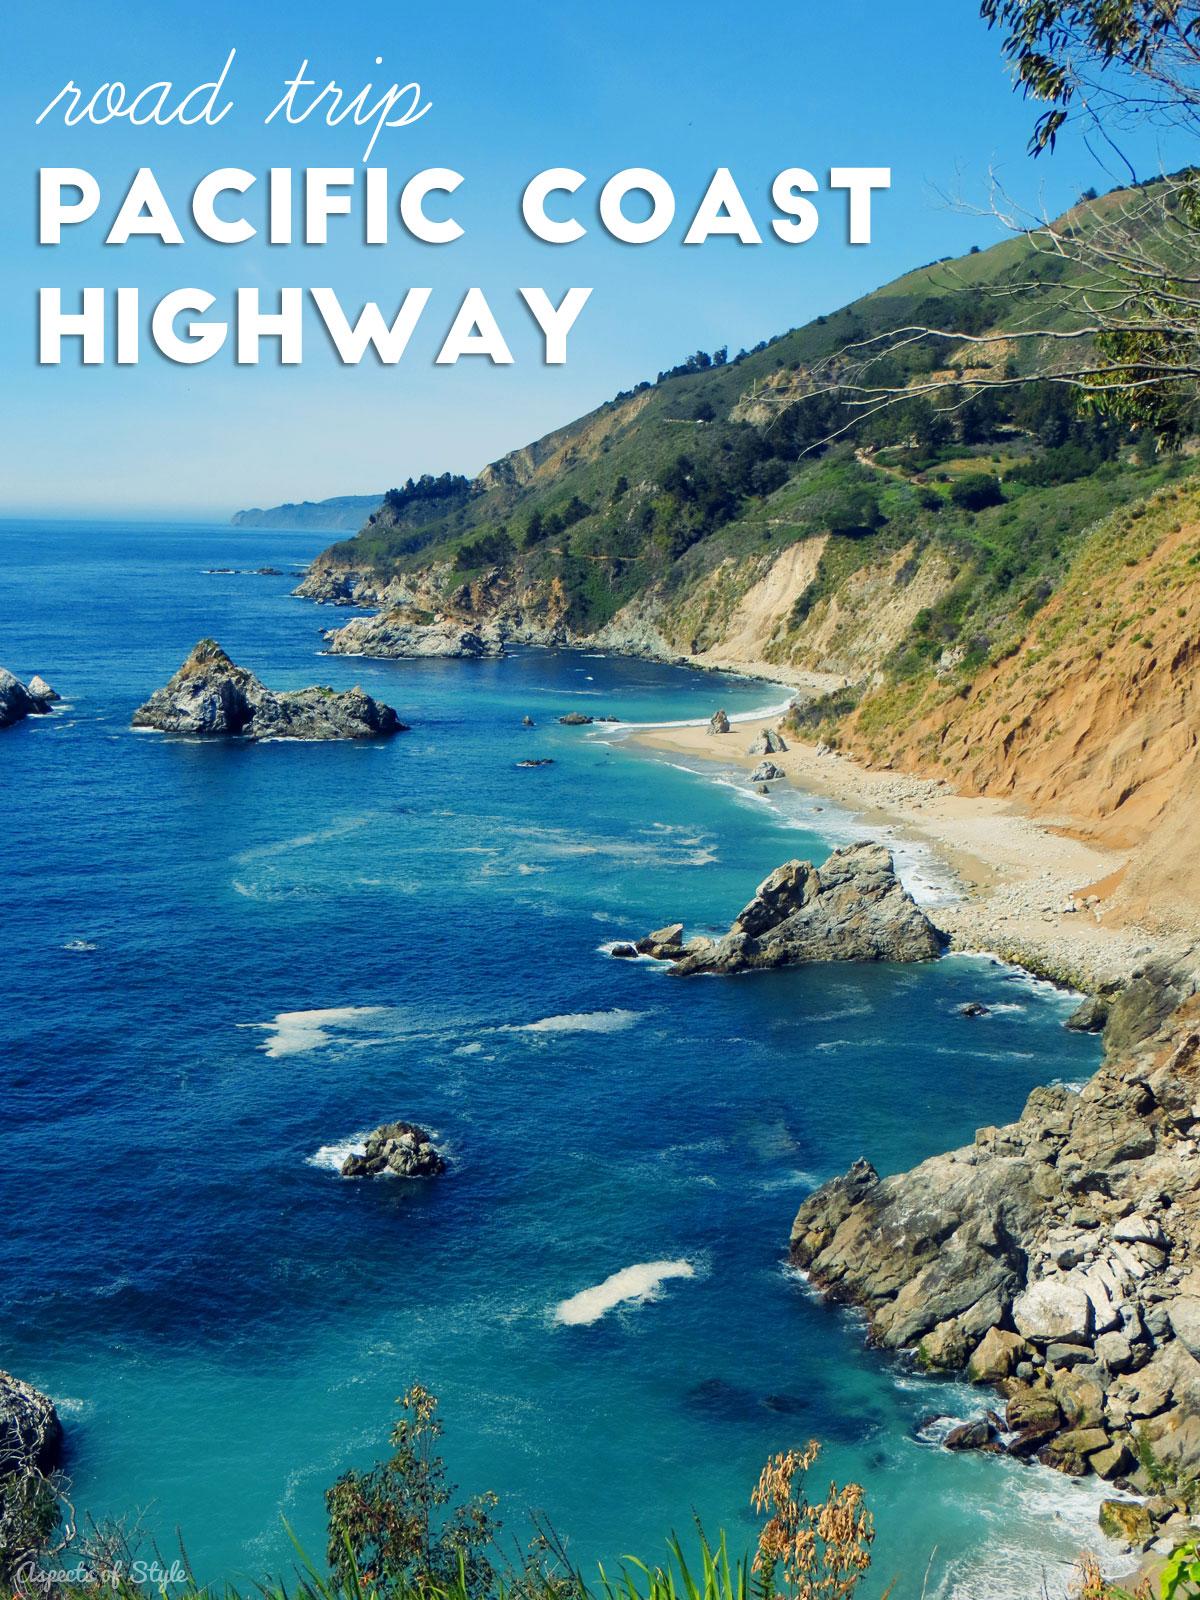 Road Trip: Pacific Coast Highway